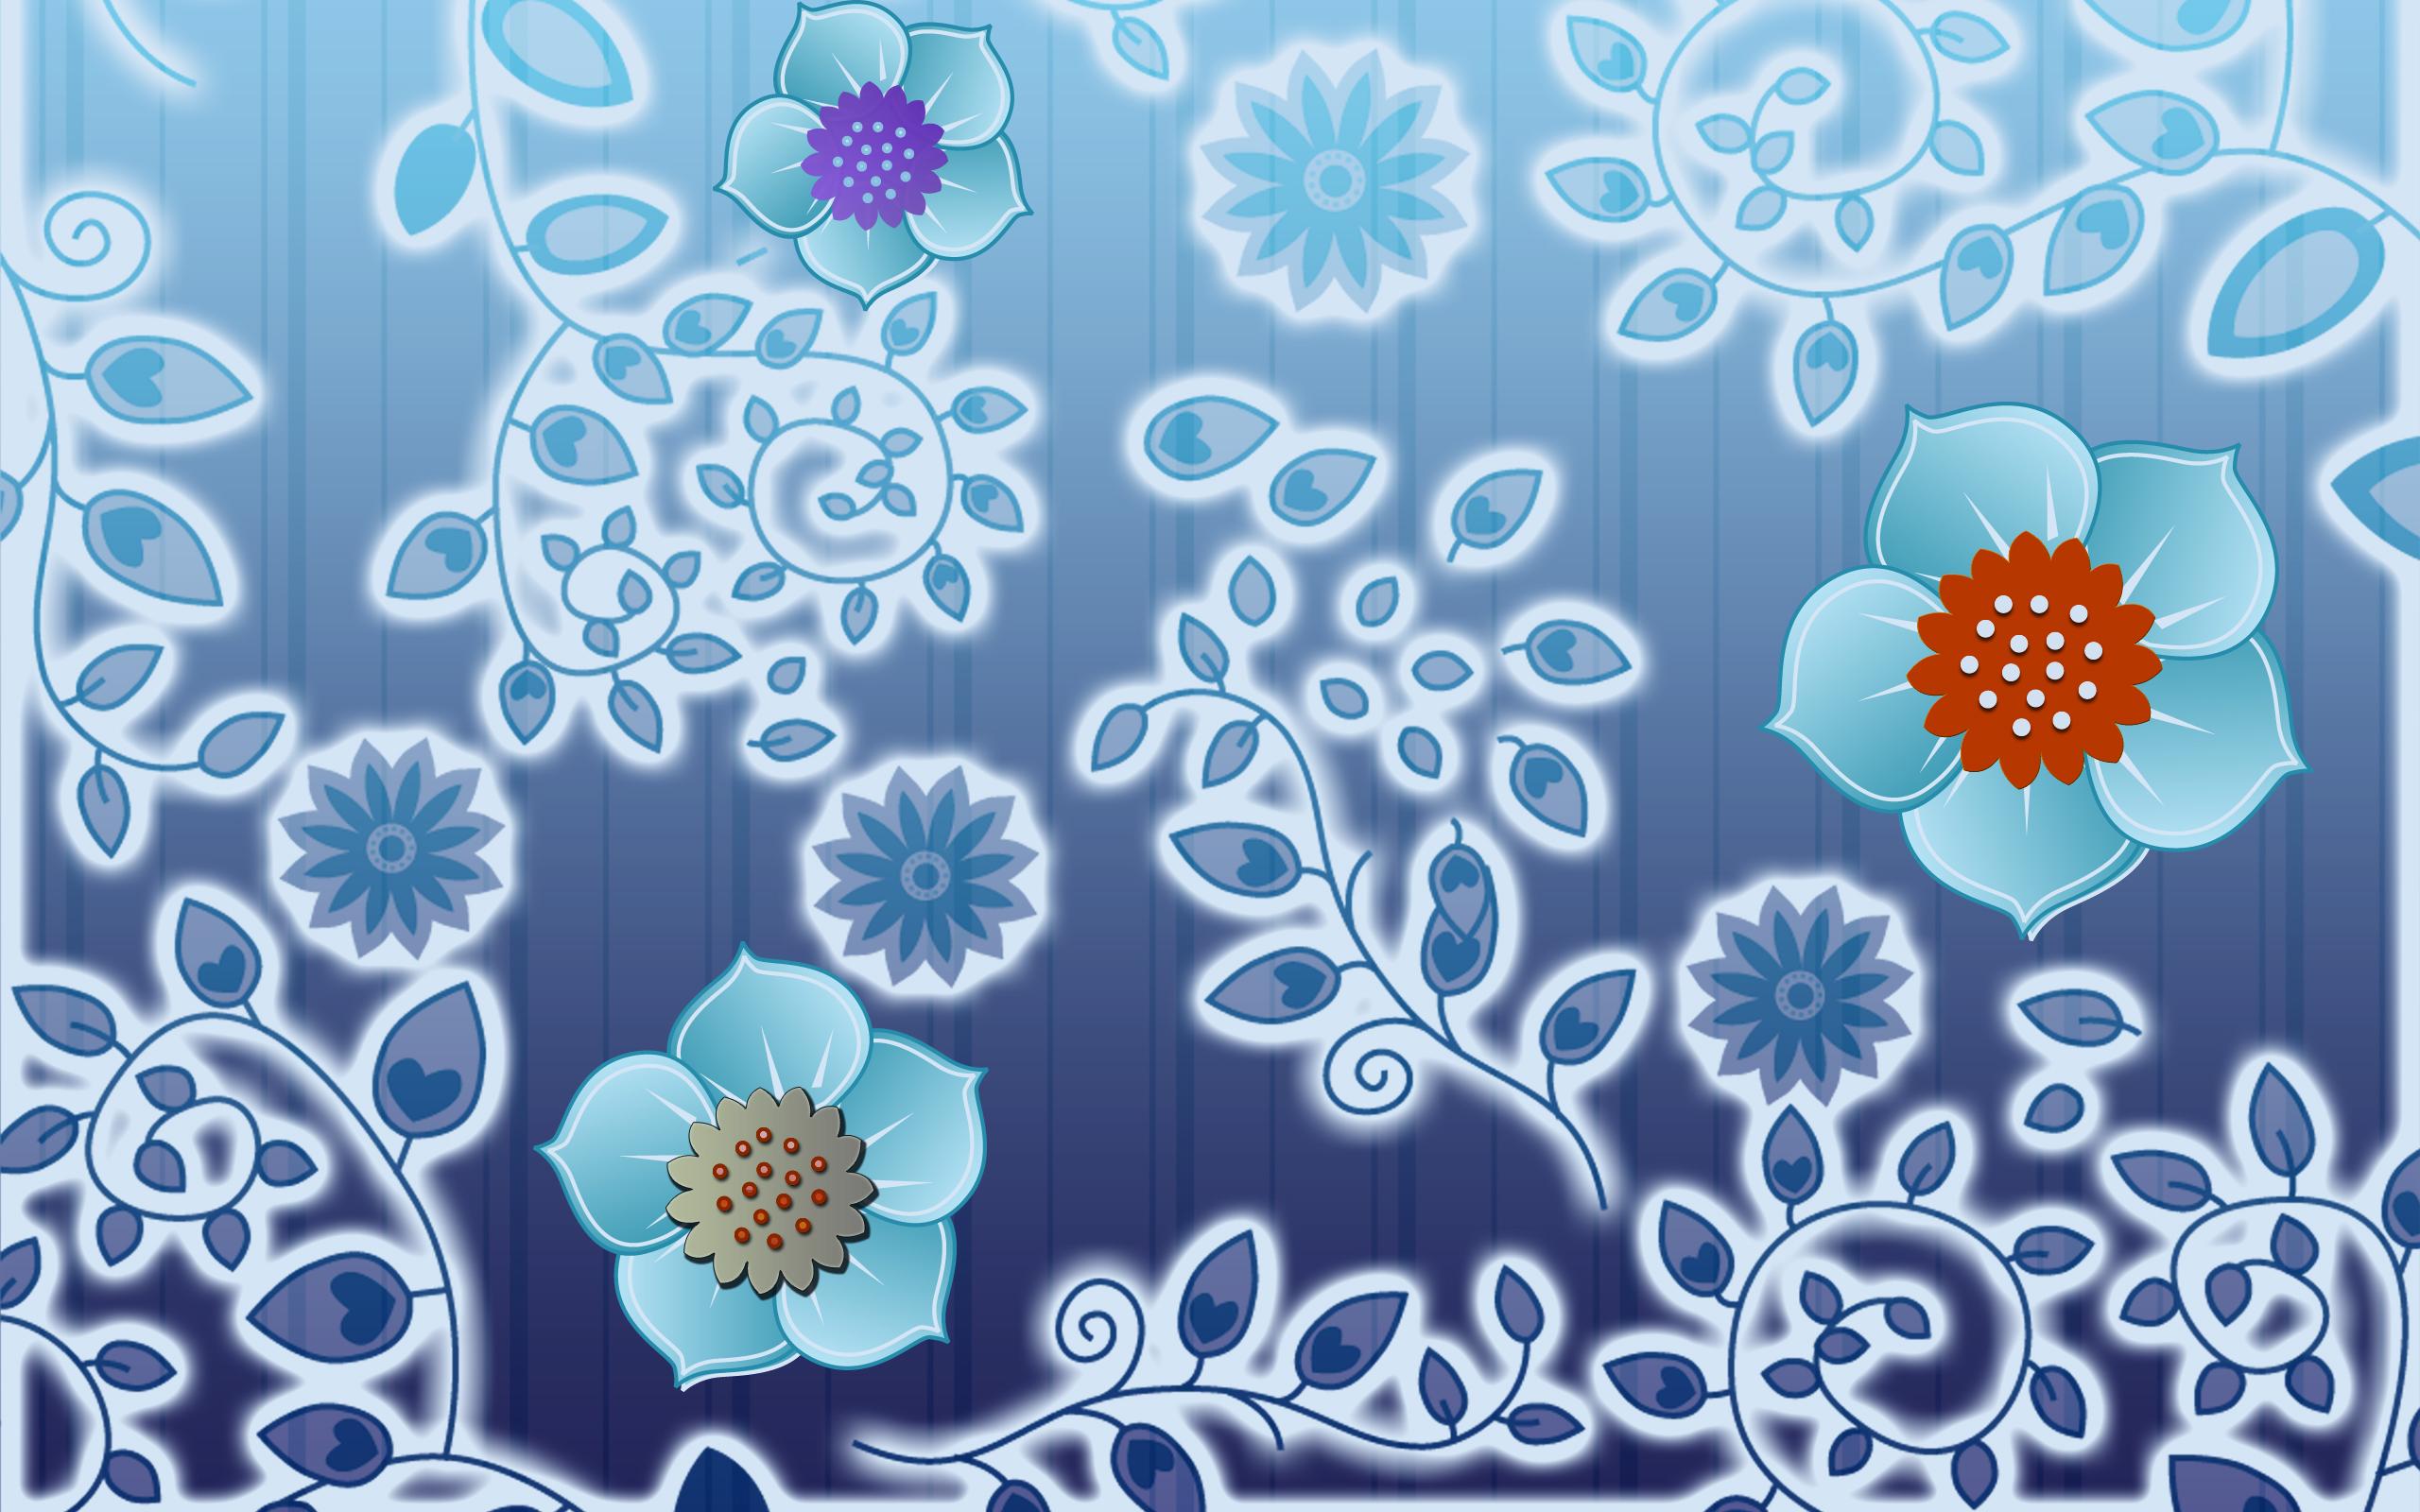 threeflowers by nucu